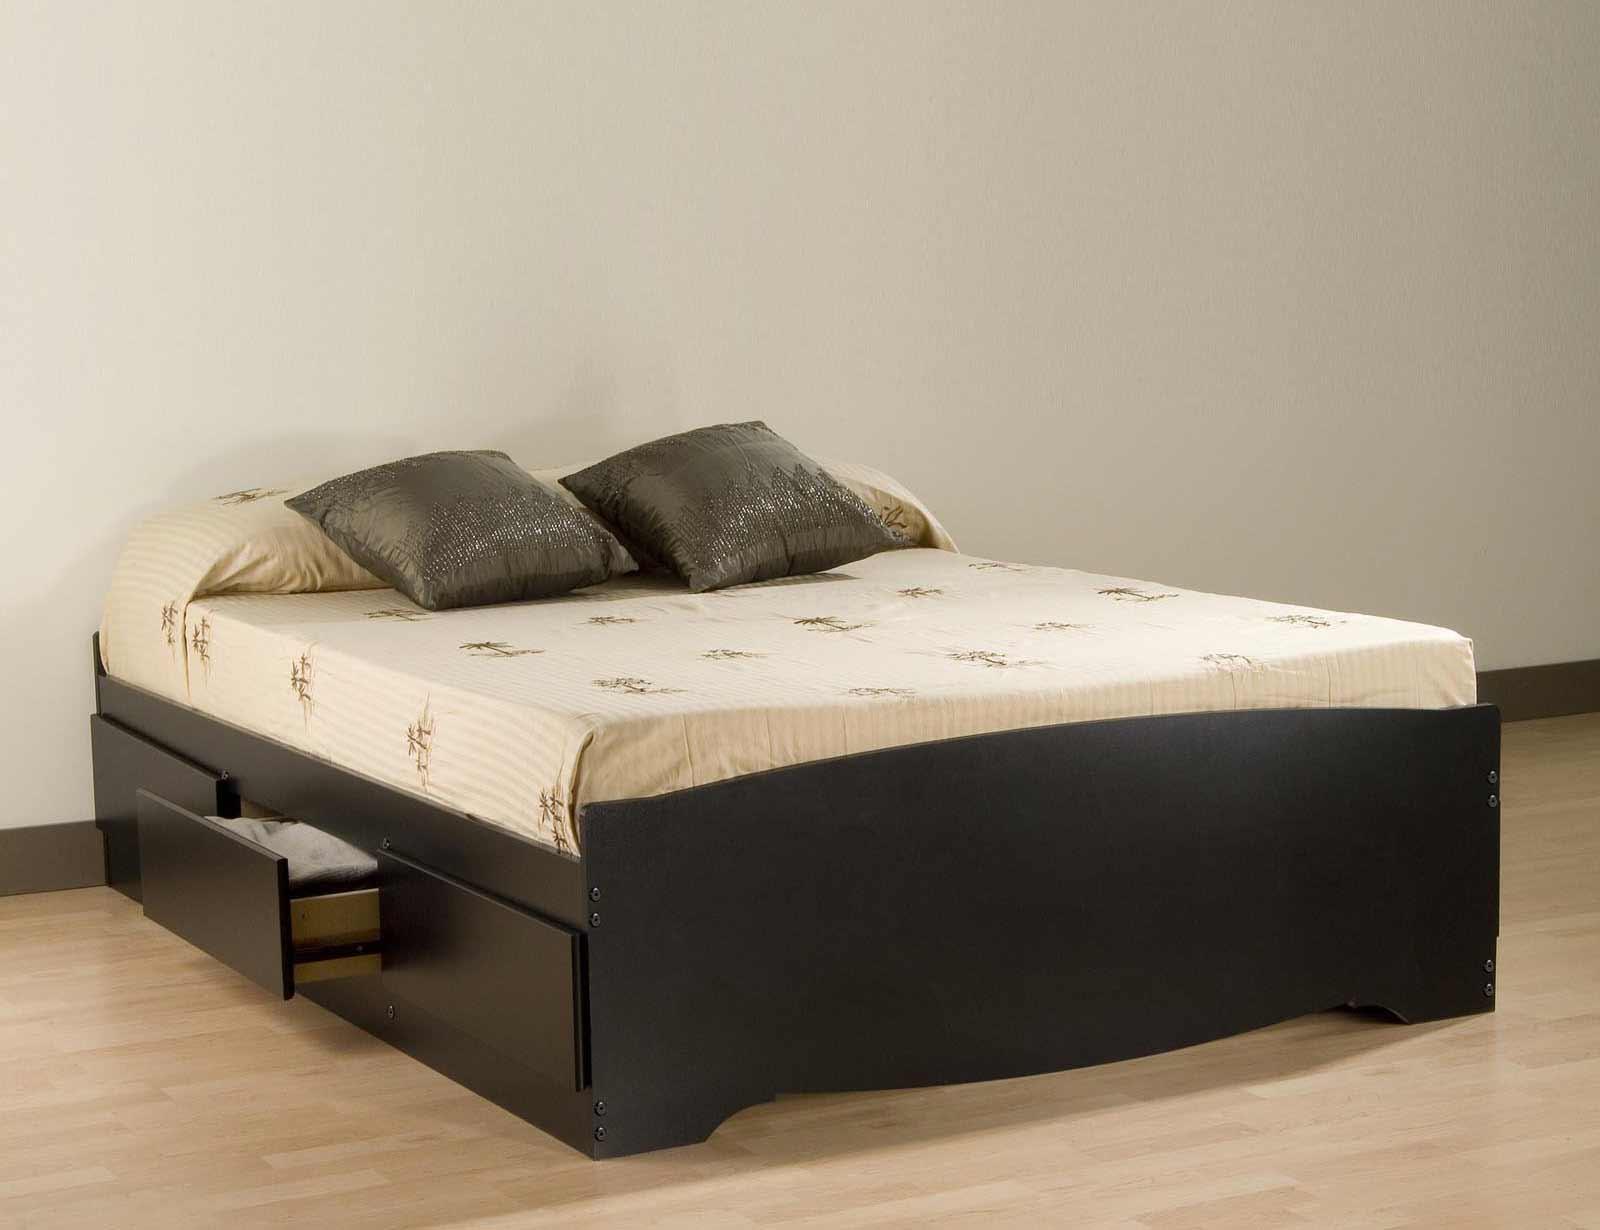 black platform beds with storage underneath